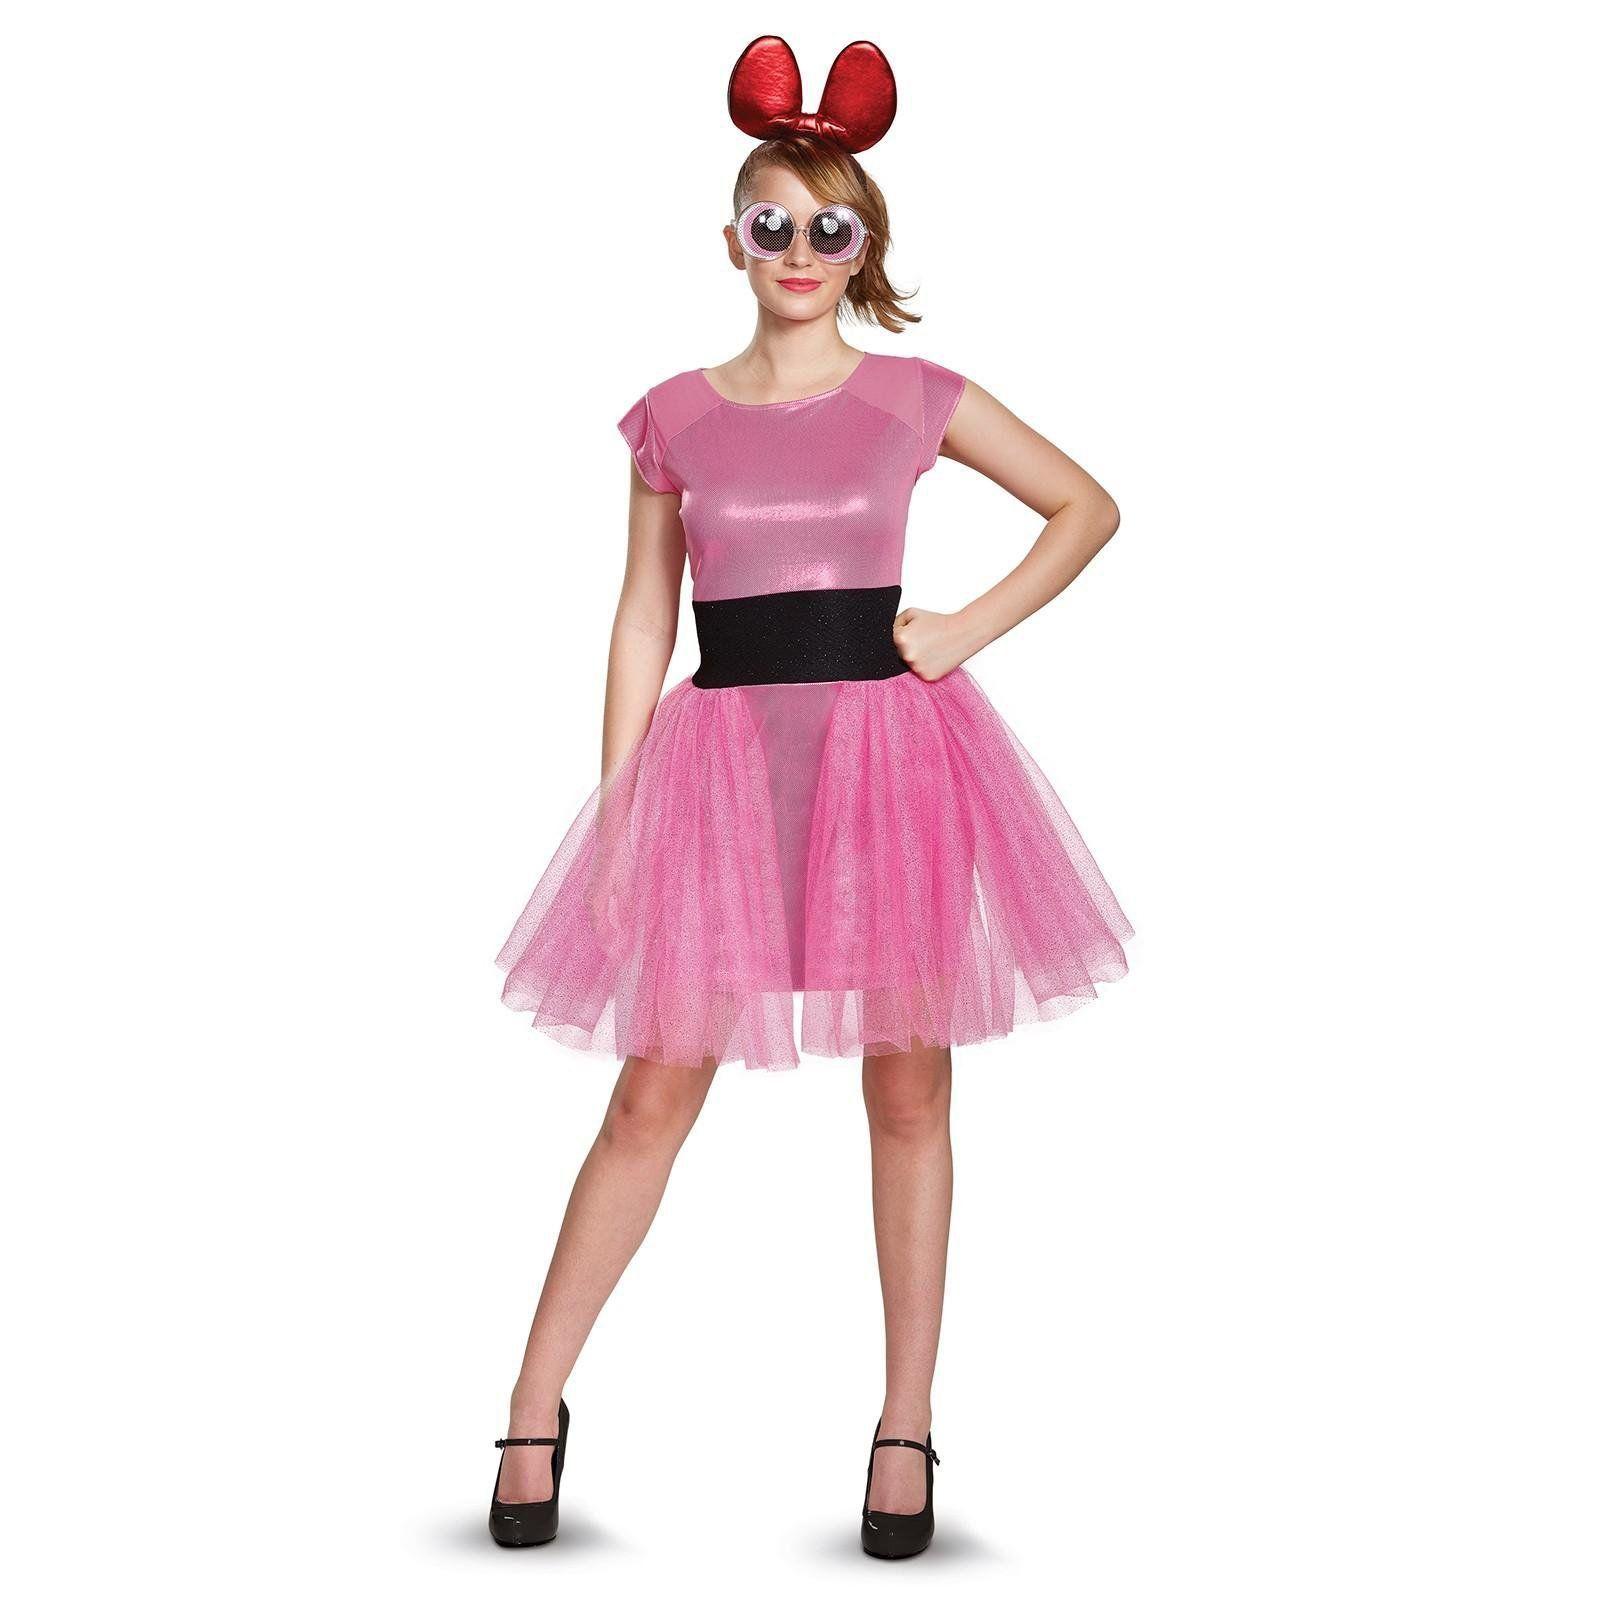 Powerpuff Girls Blossom Deluxe Teen Costume | Teen costumes ...